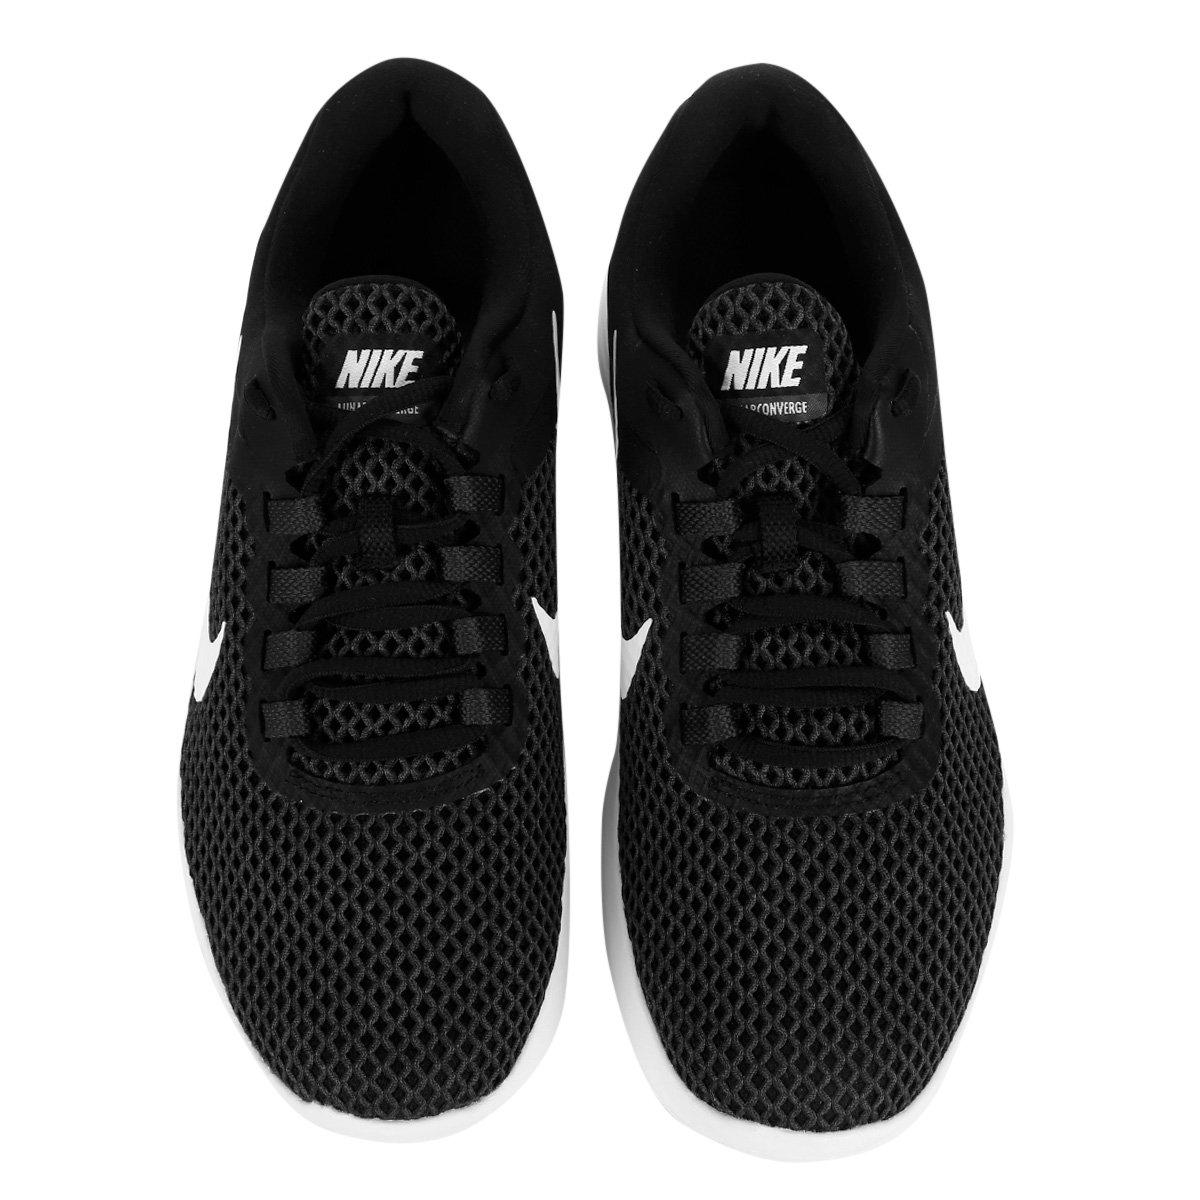 Tênis Nike Lunarconverge 2 Masculino  Tênis Nike Lunarconverge 2 Masculino  ... 7804dfd51d188